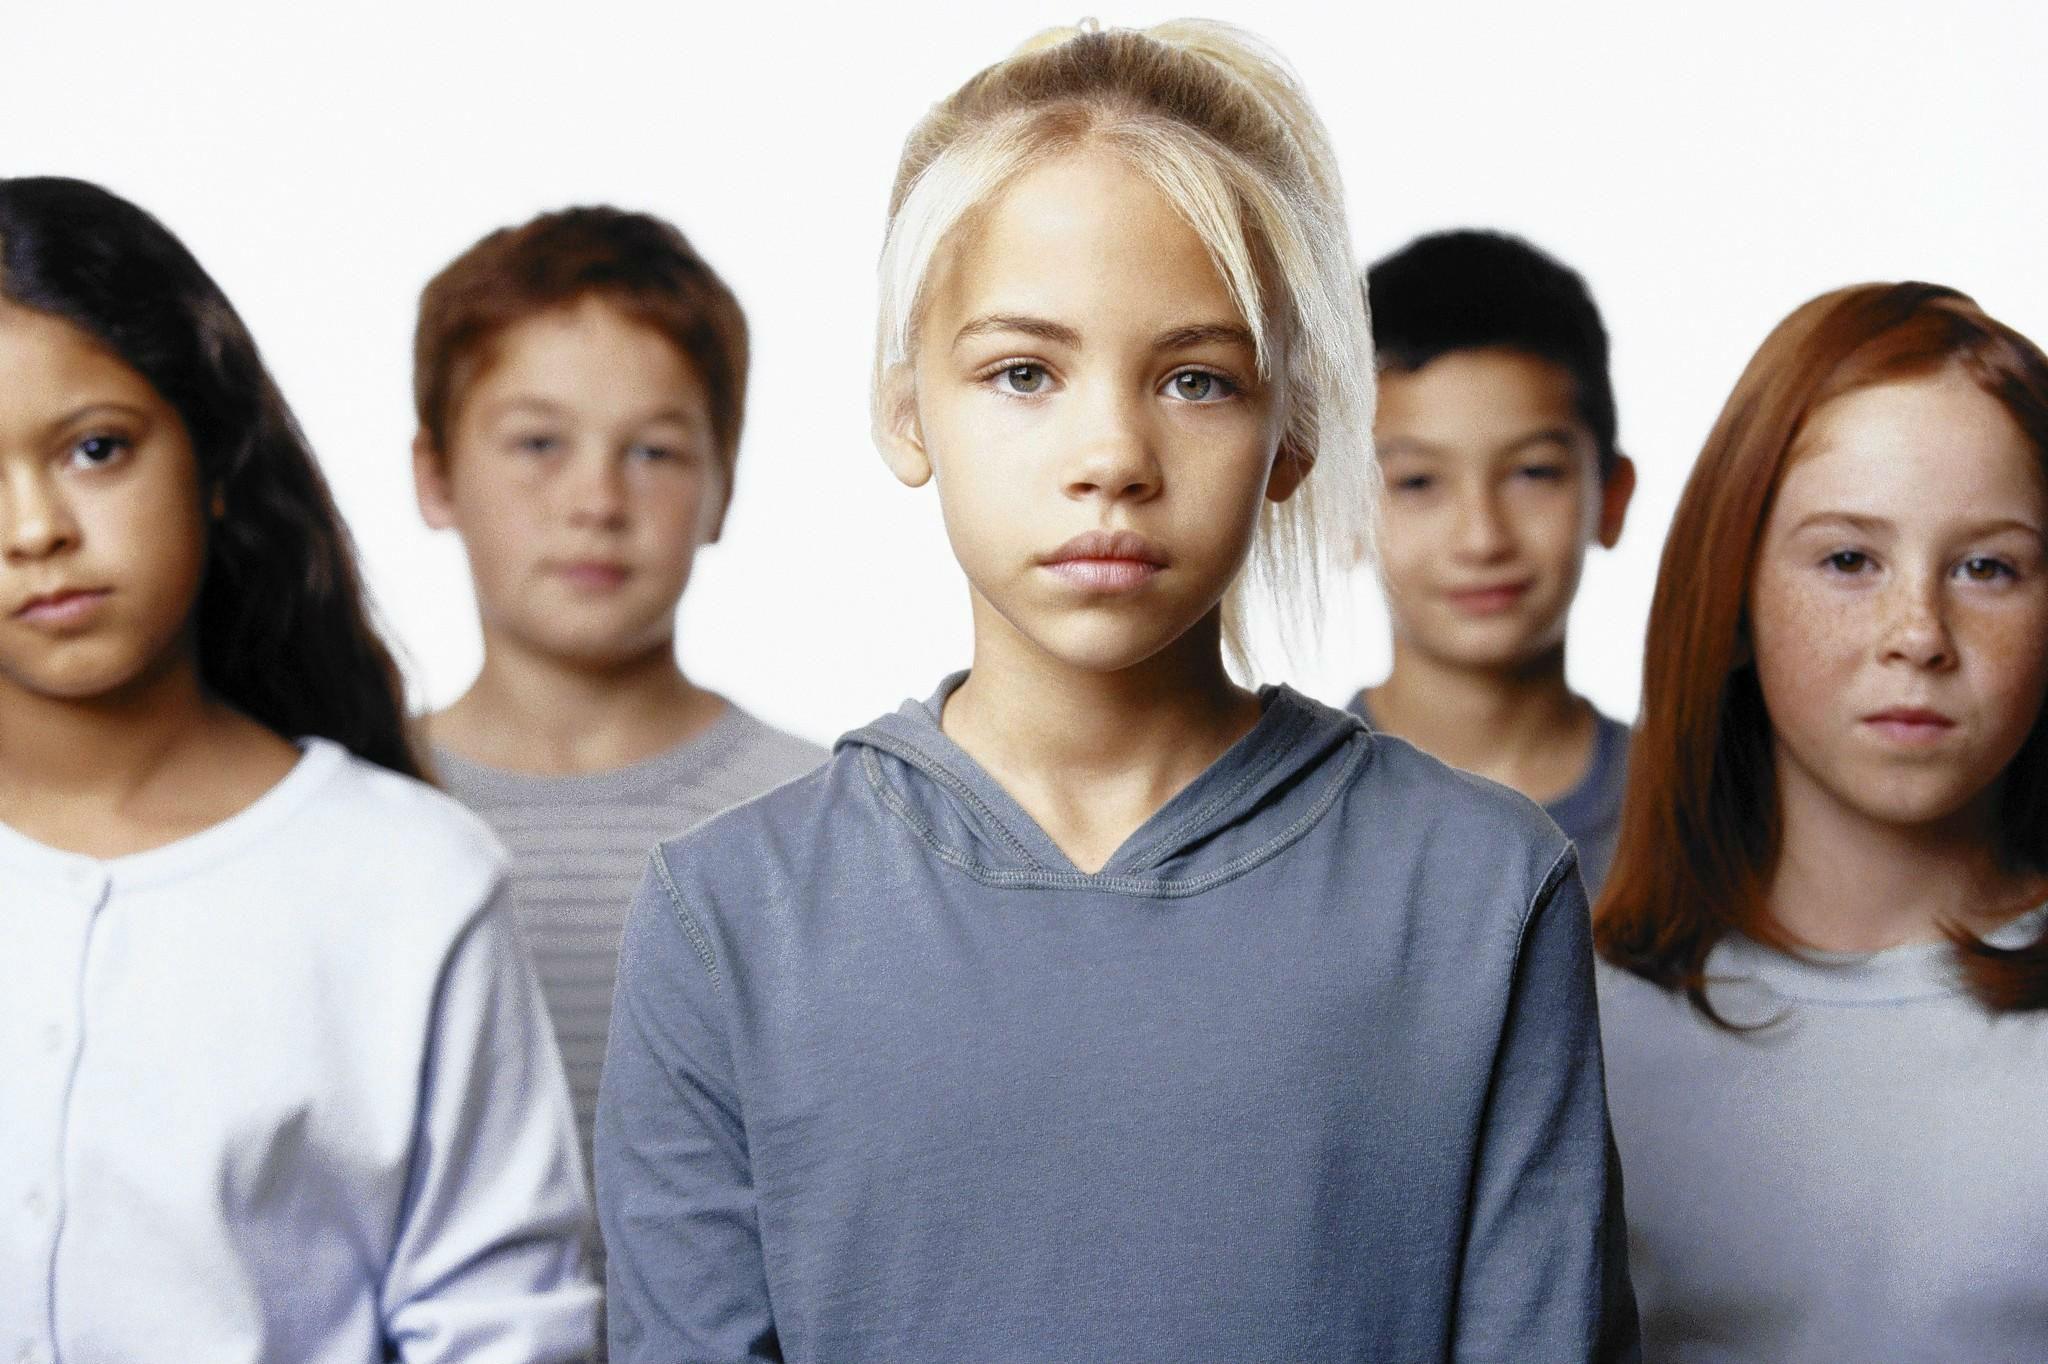 ADHD Medication For Children